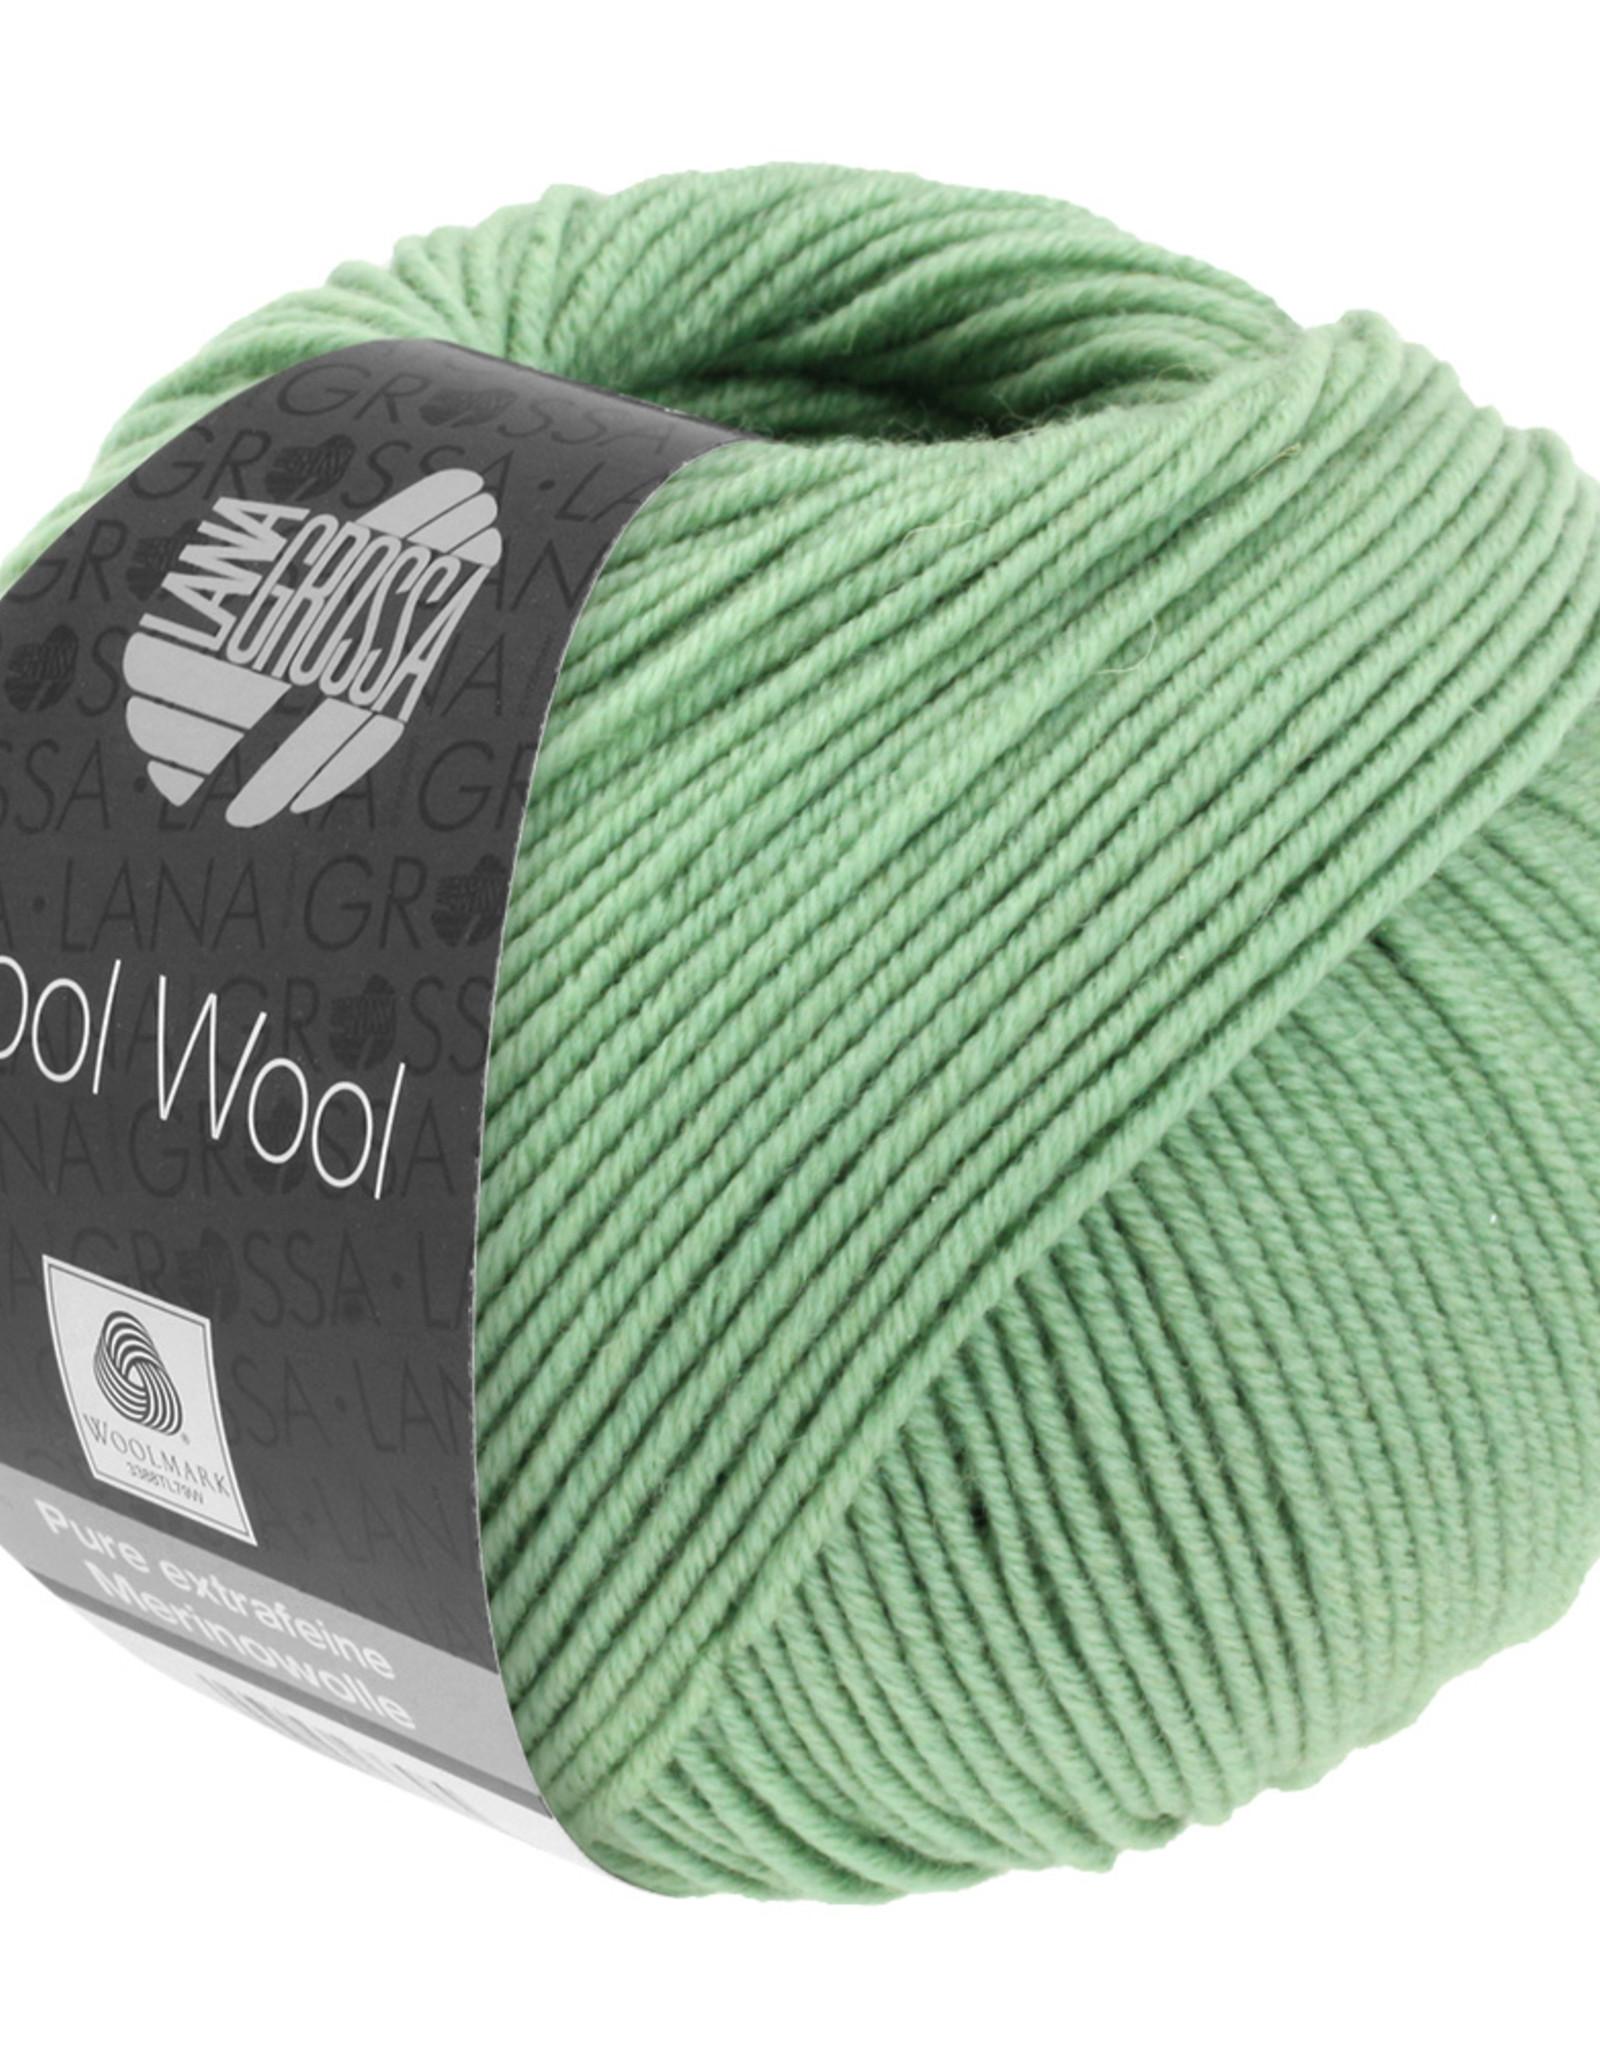 Lana Grossa Cool Wool raglan damestrui